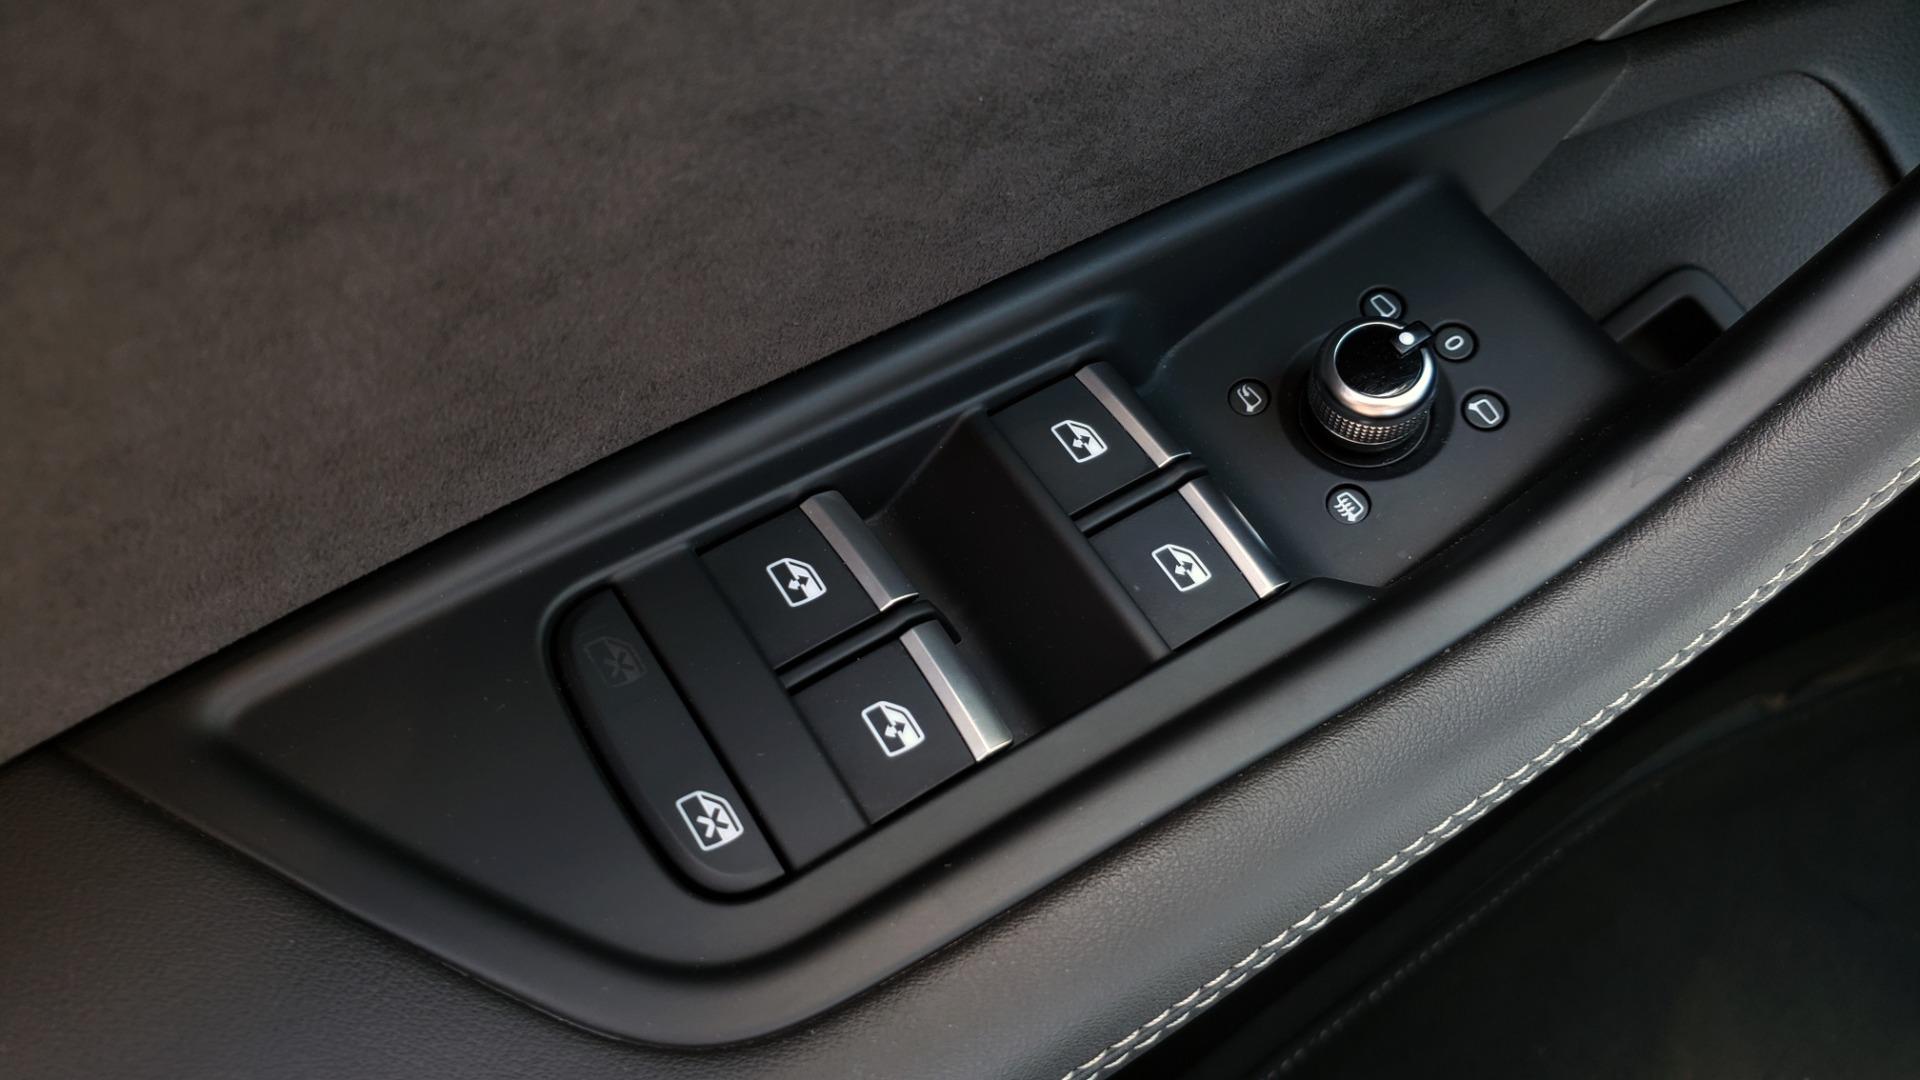 Used 2018 Audi S5 SPORTBACK PRESTIGE S-SPORT / NAV / SUNROOF / HUD / B&O SND / REARVIEW for sale $48,995 at Formula Imports in Charlotte NC 28227 37